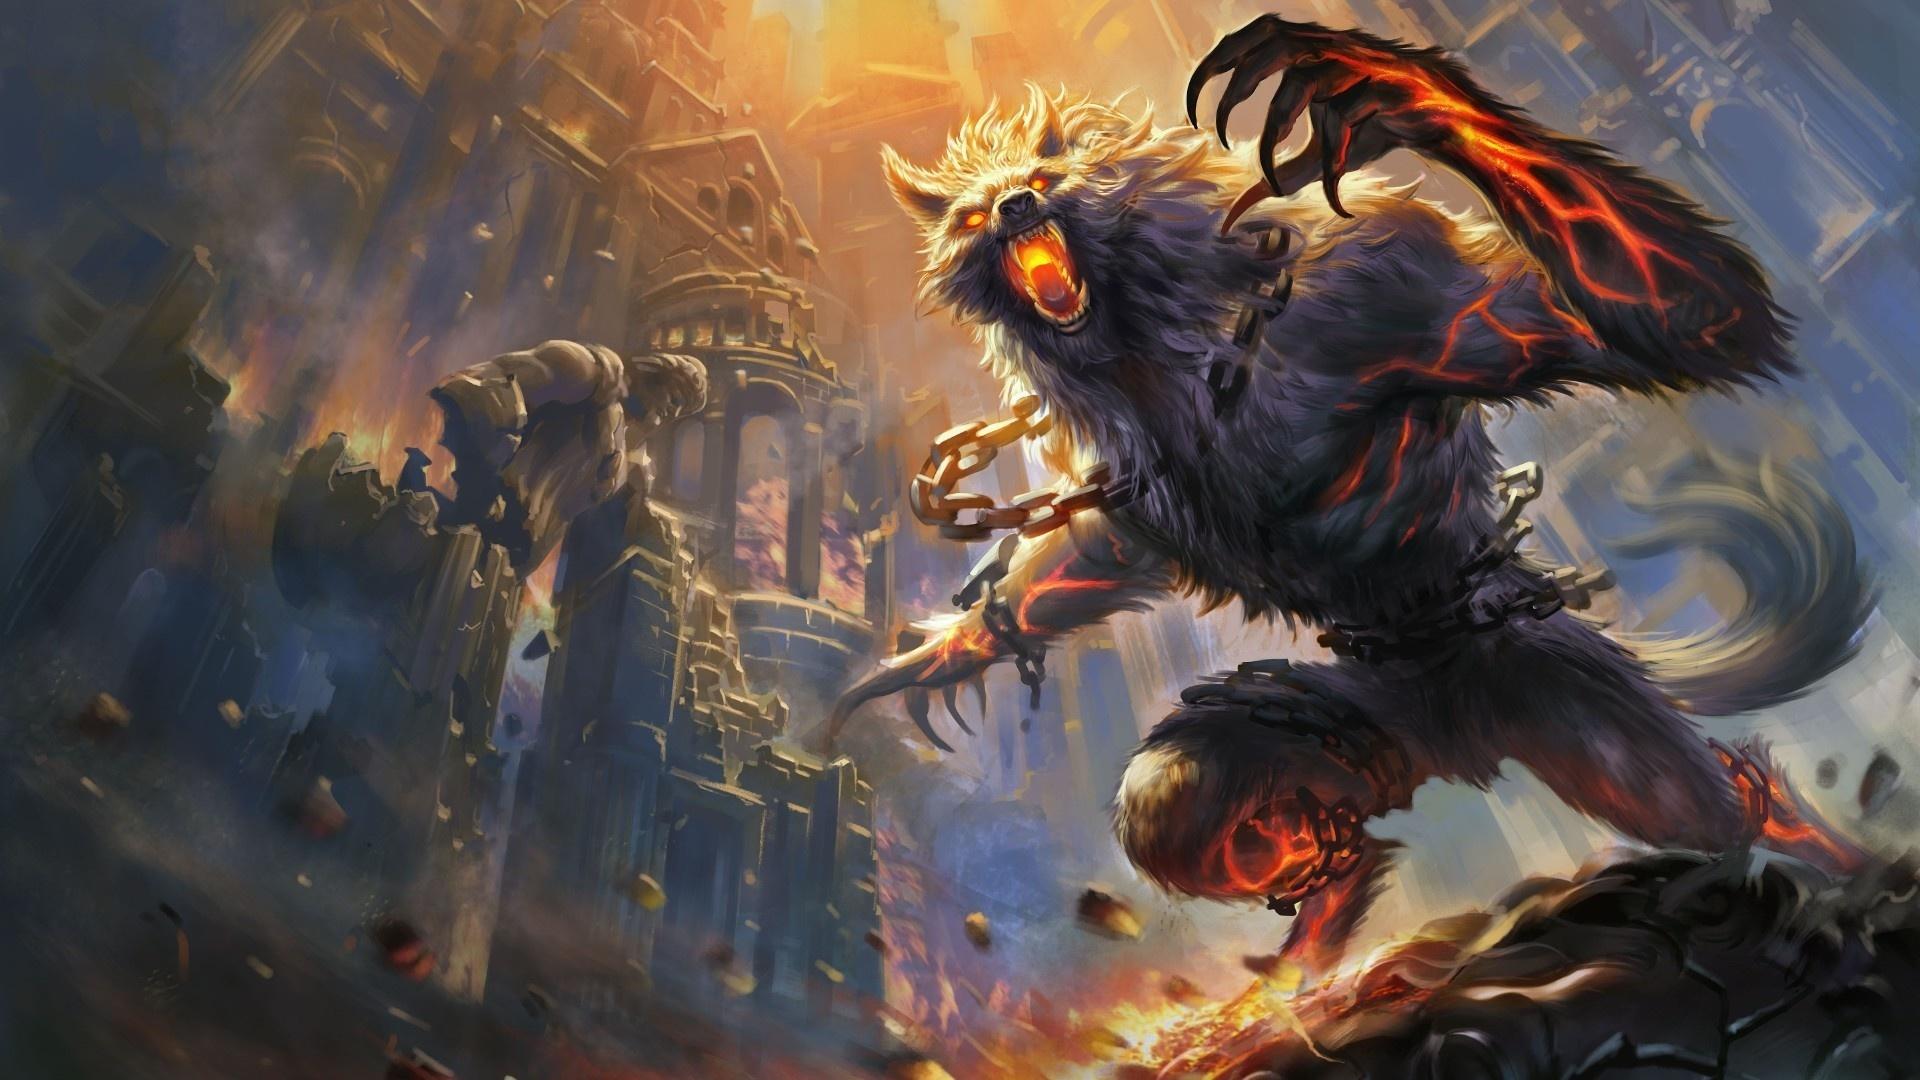 Werewolf desktop wallpaper free download